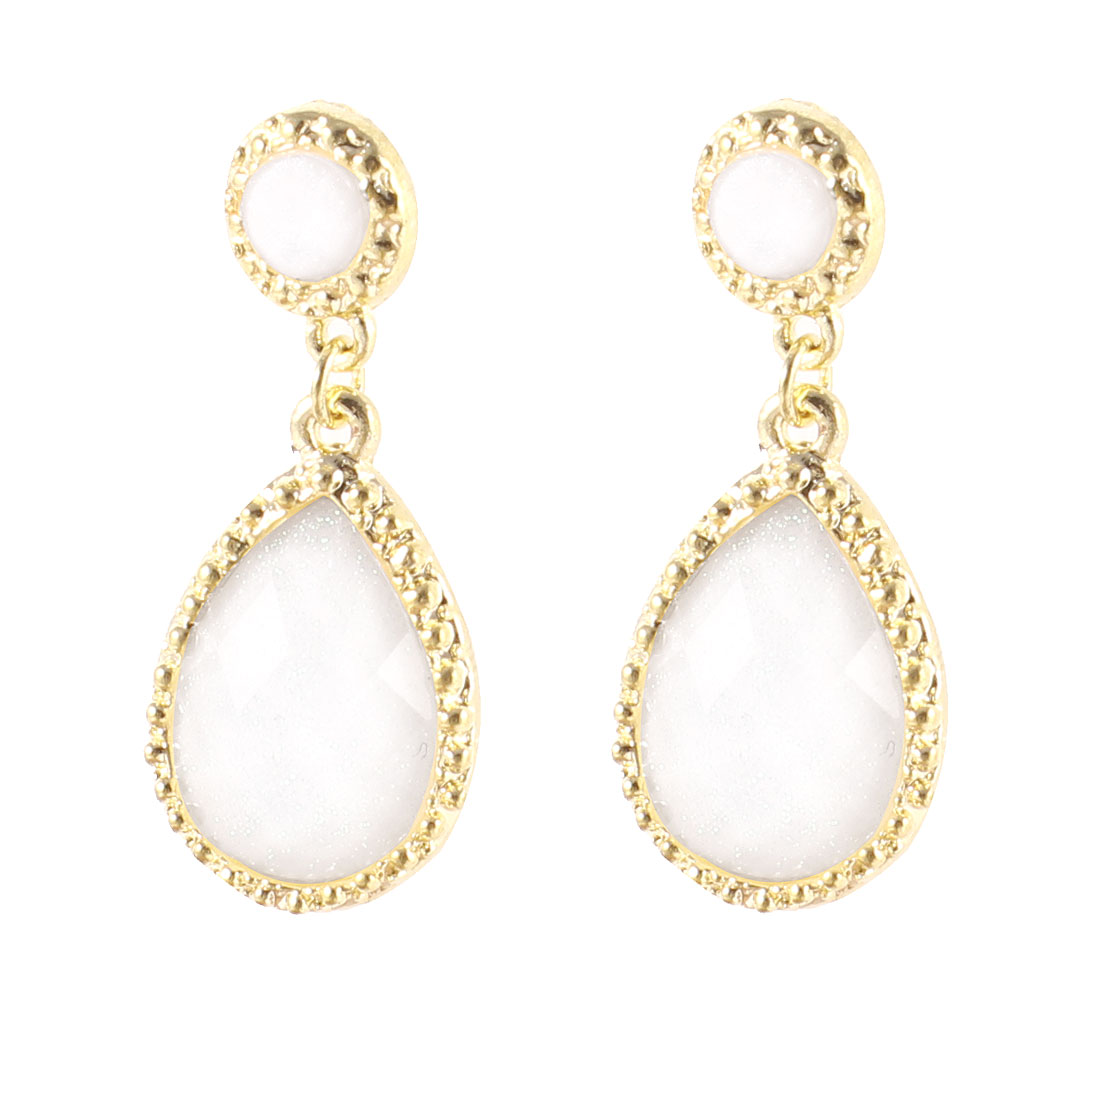 Off White Plastic Bead Decor Waterdrop Pendant Stud Earrings Earbob Pair